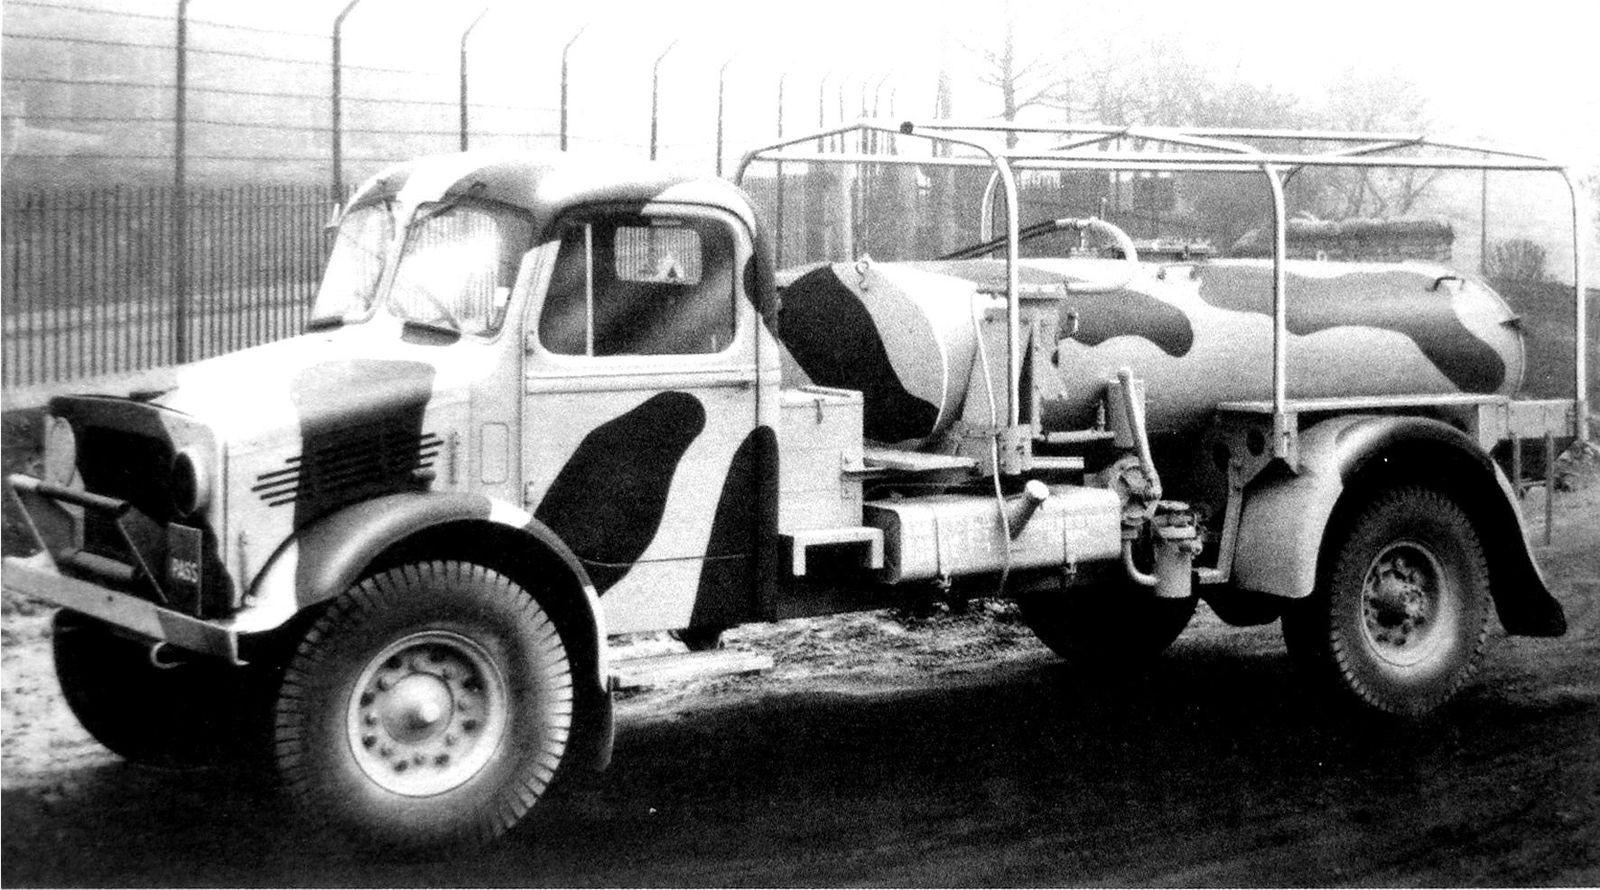 Ford, Bedford, Austin и, конечно, Studebaker: знаменитые и малоизвестные грузовики ленд-лиза